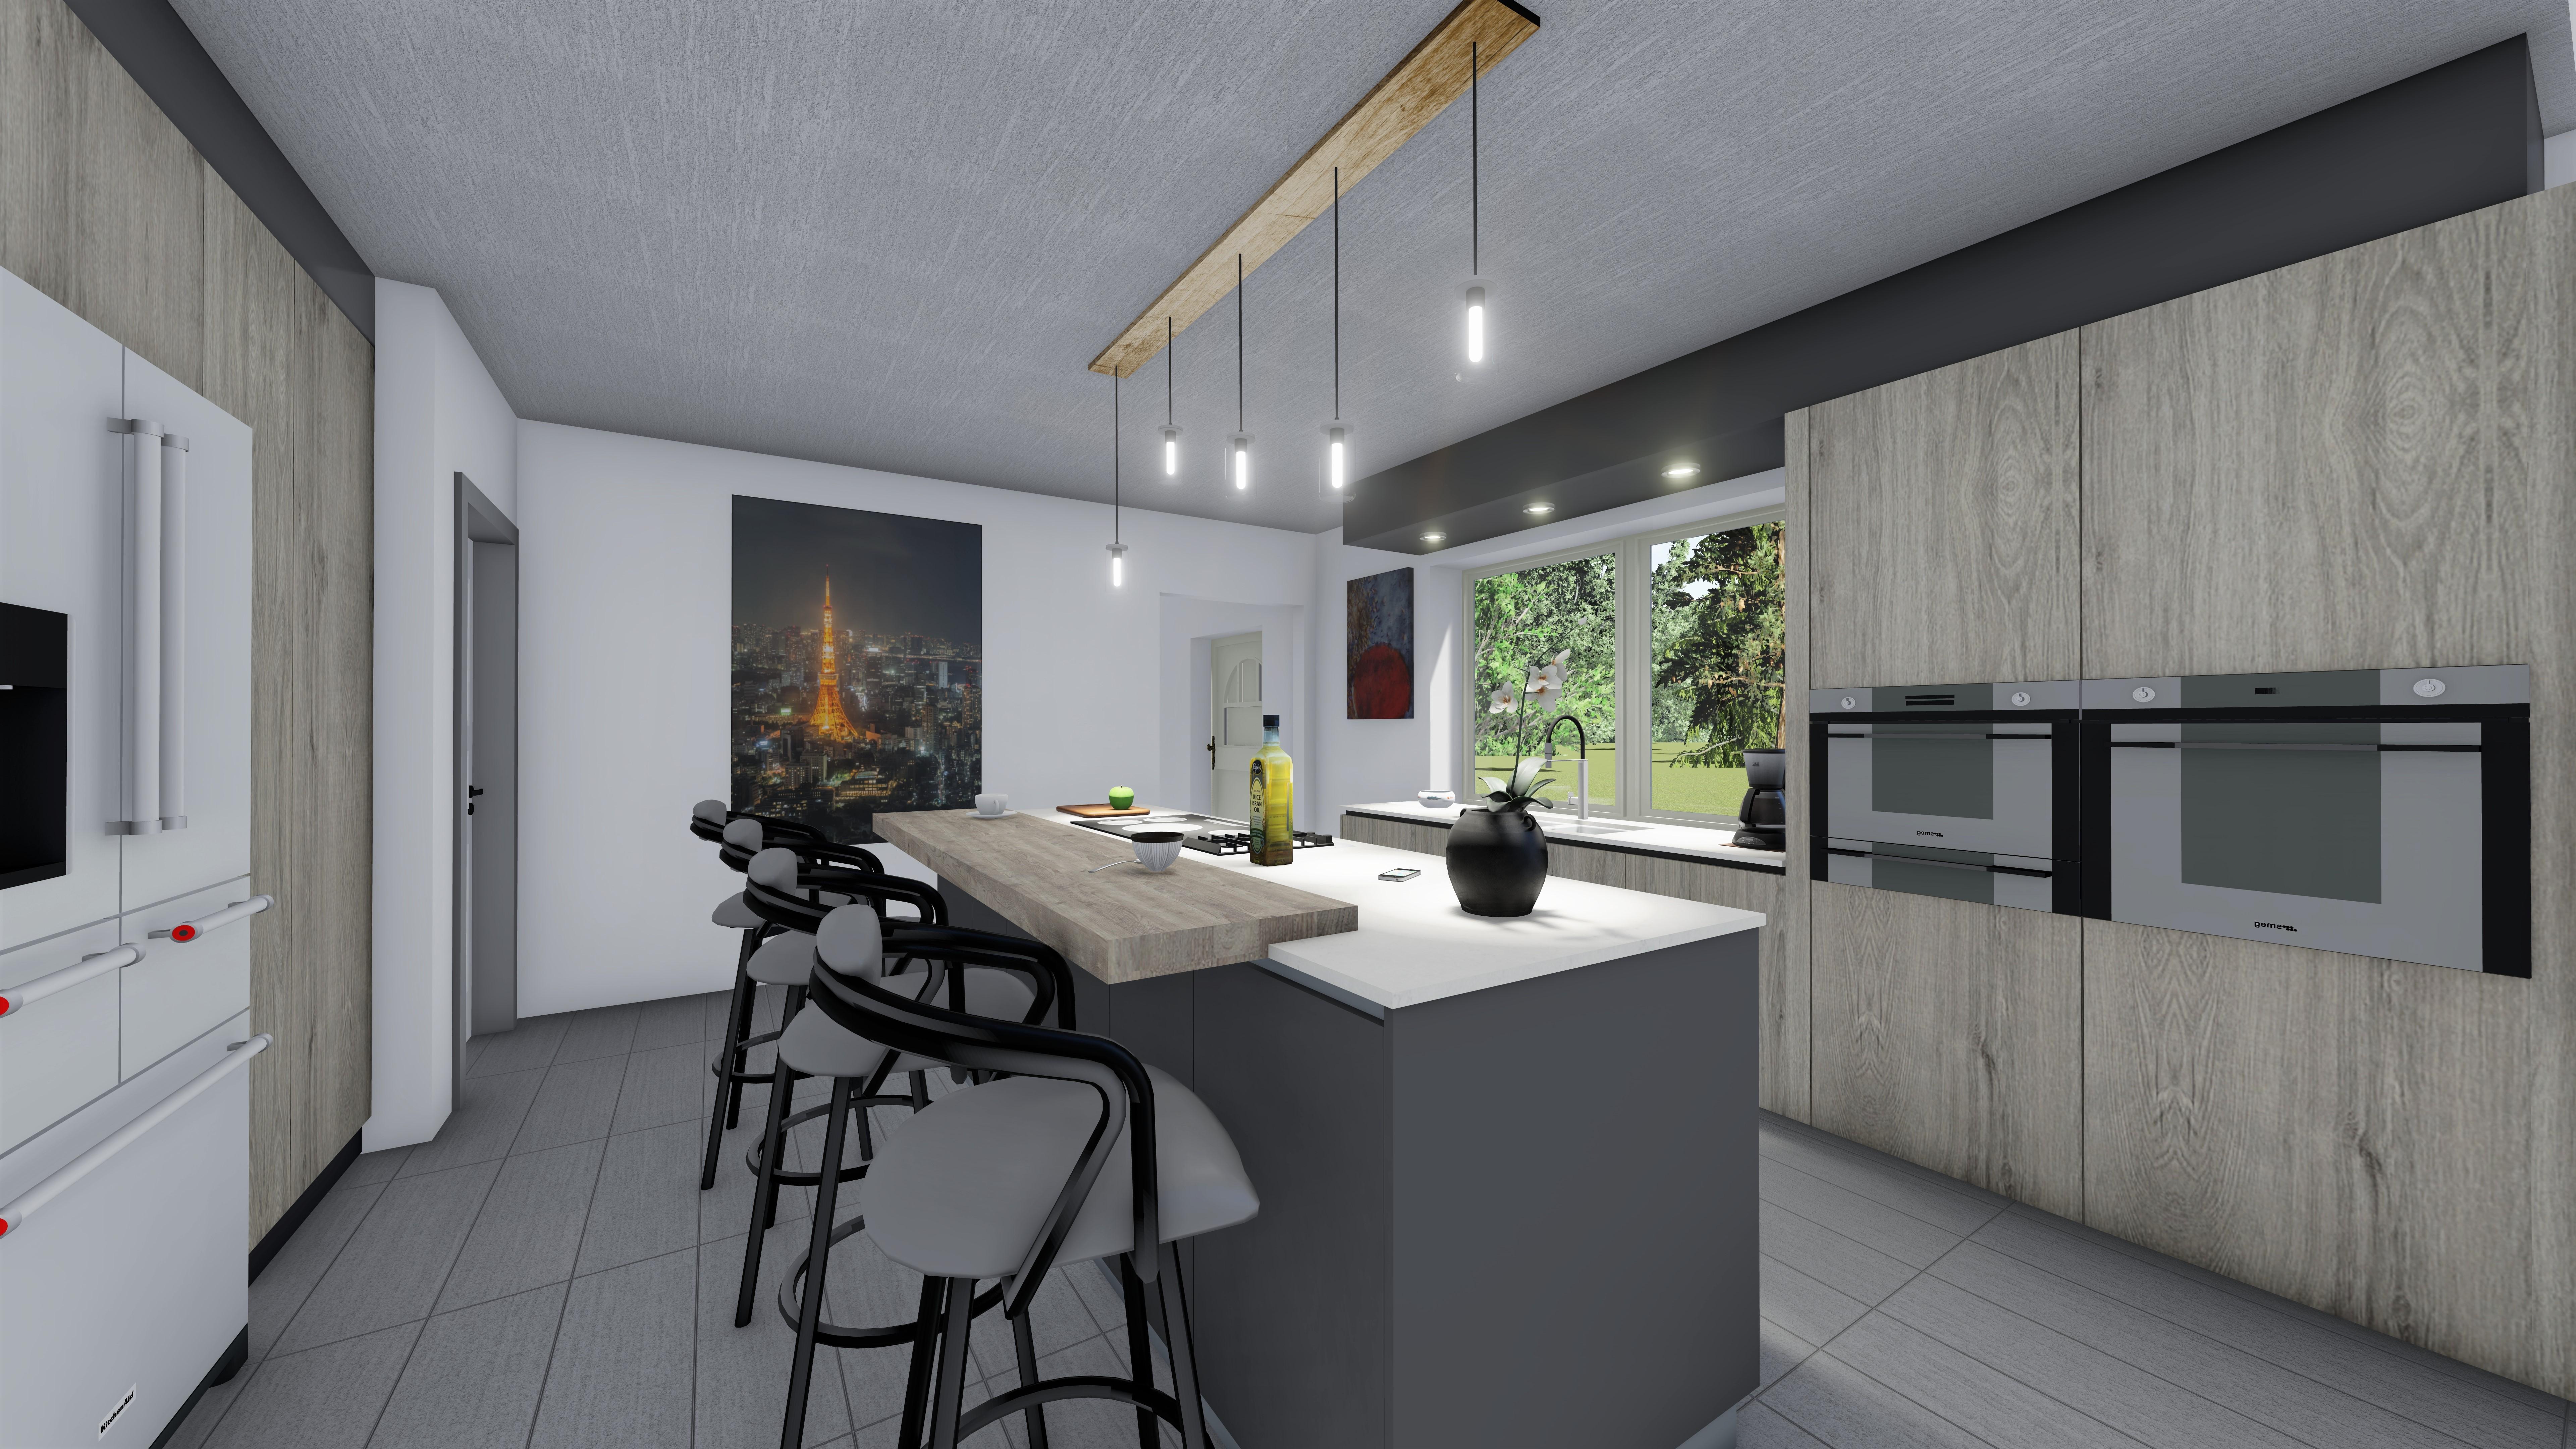 keuken_12 - Foto